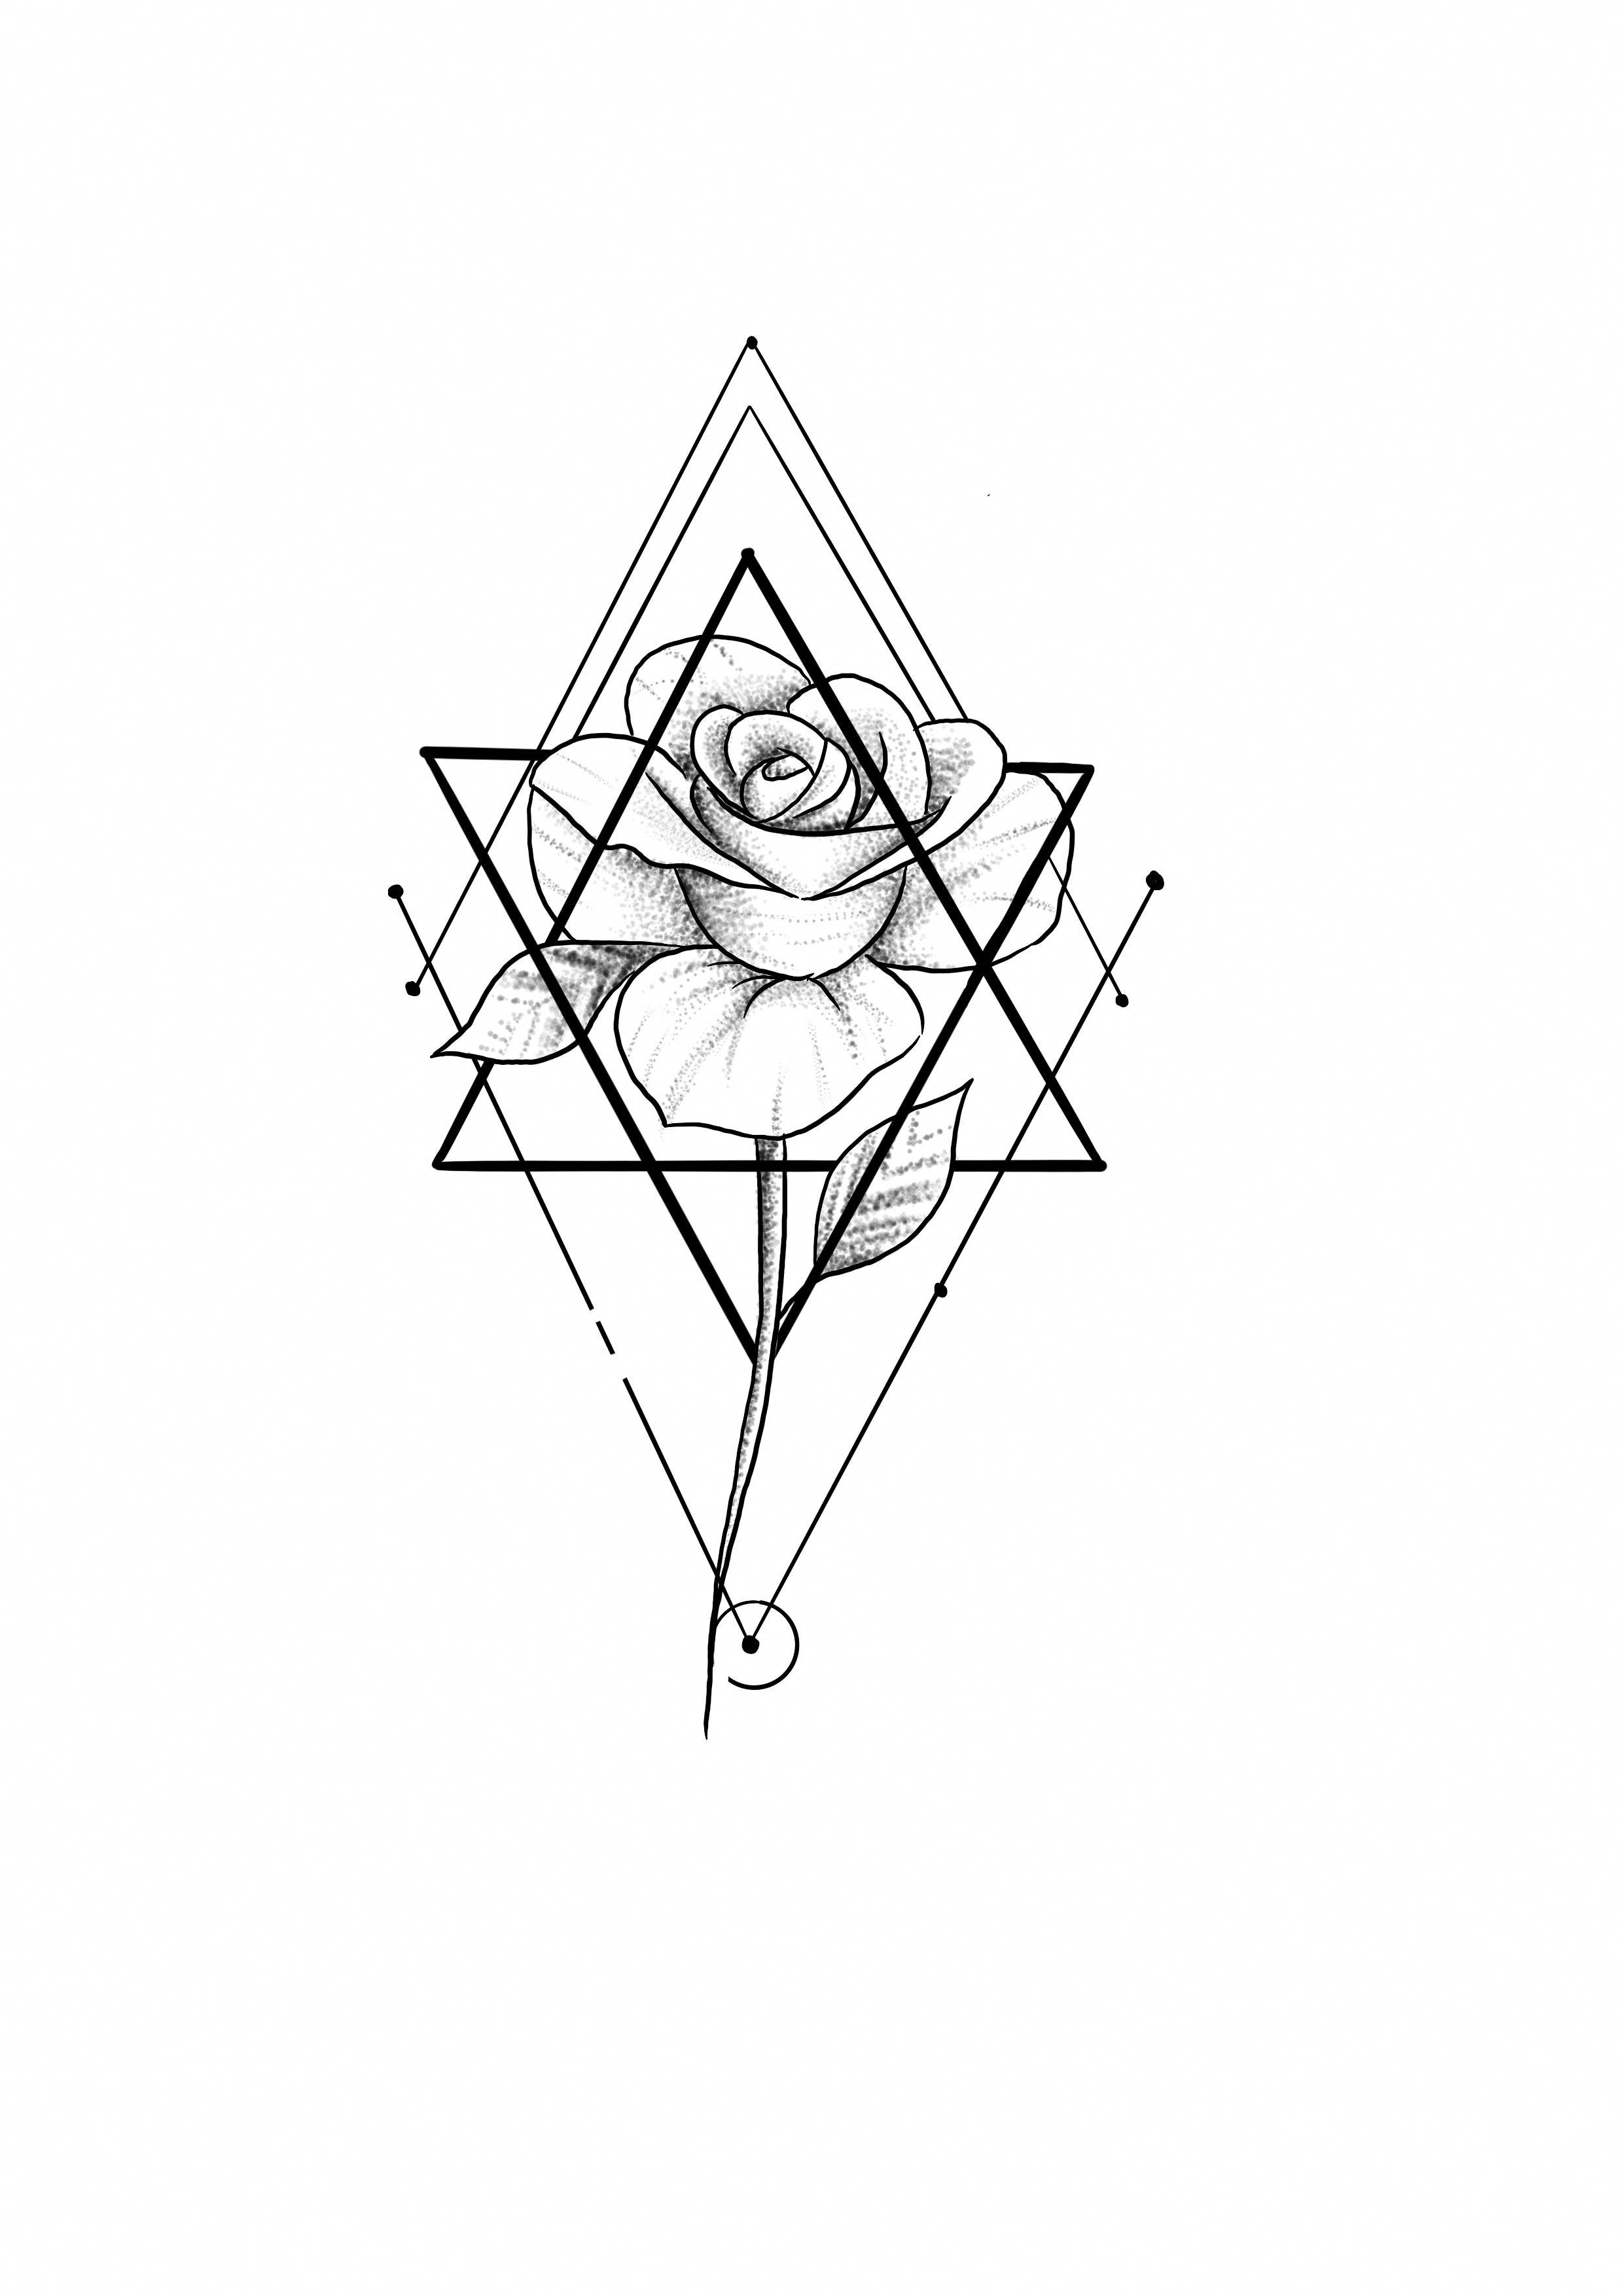 simple geometric tattoo  simple geometric tattoo   simple geometric tattoo  simple geometric tattoo